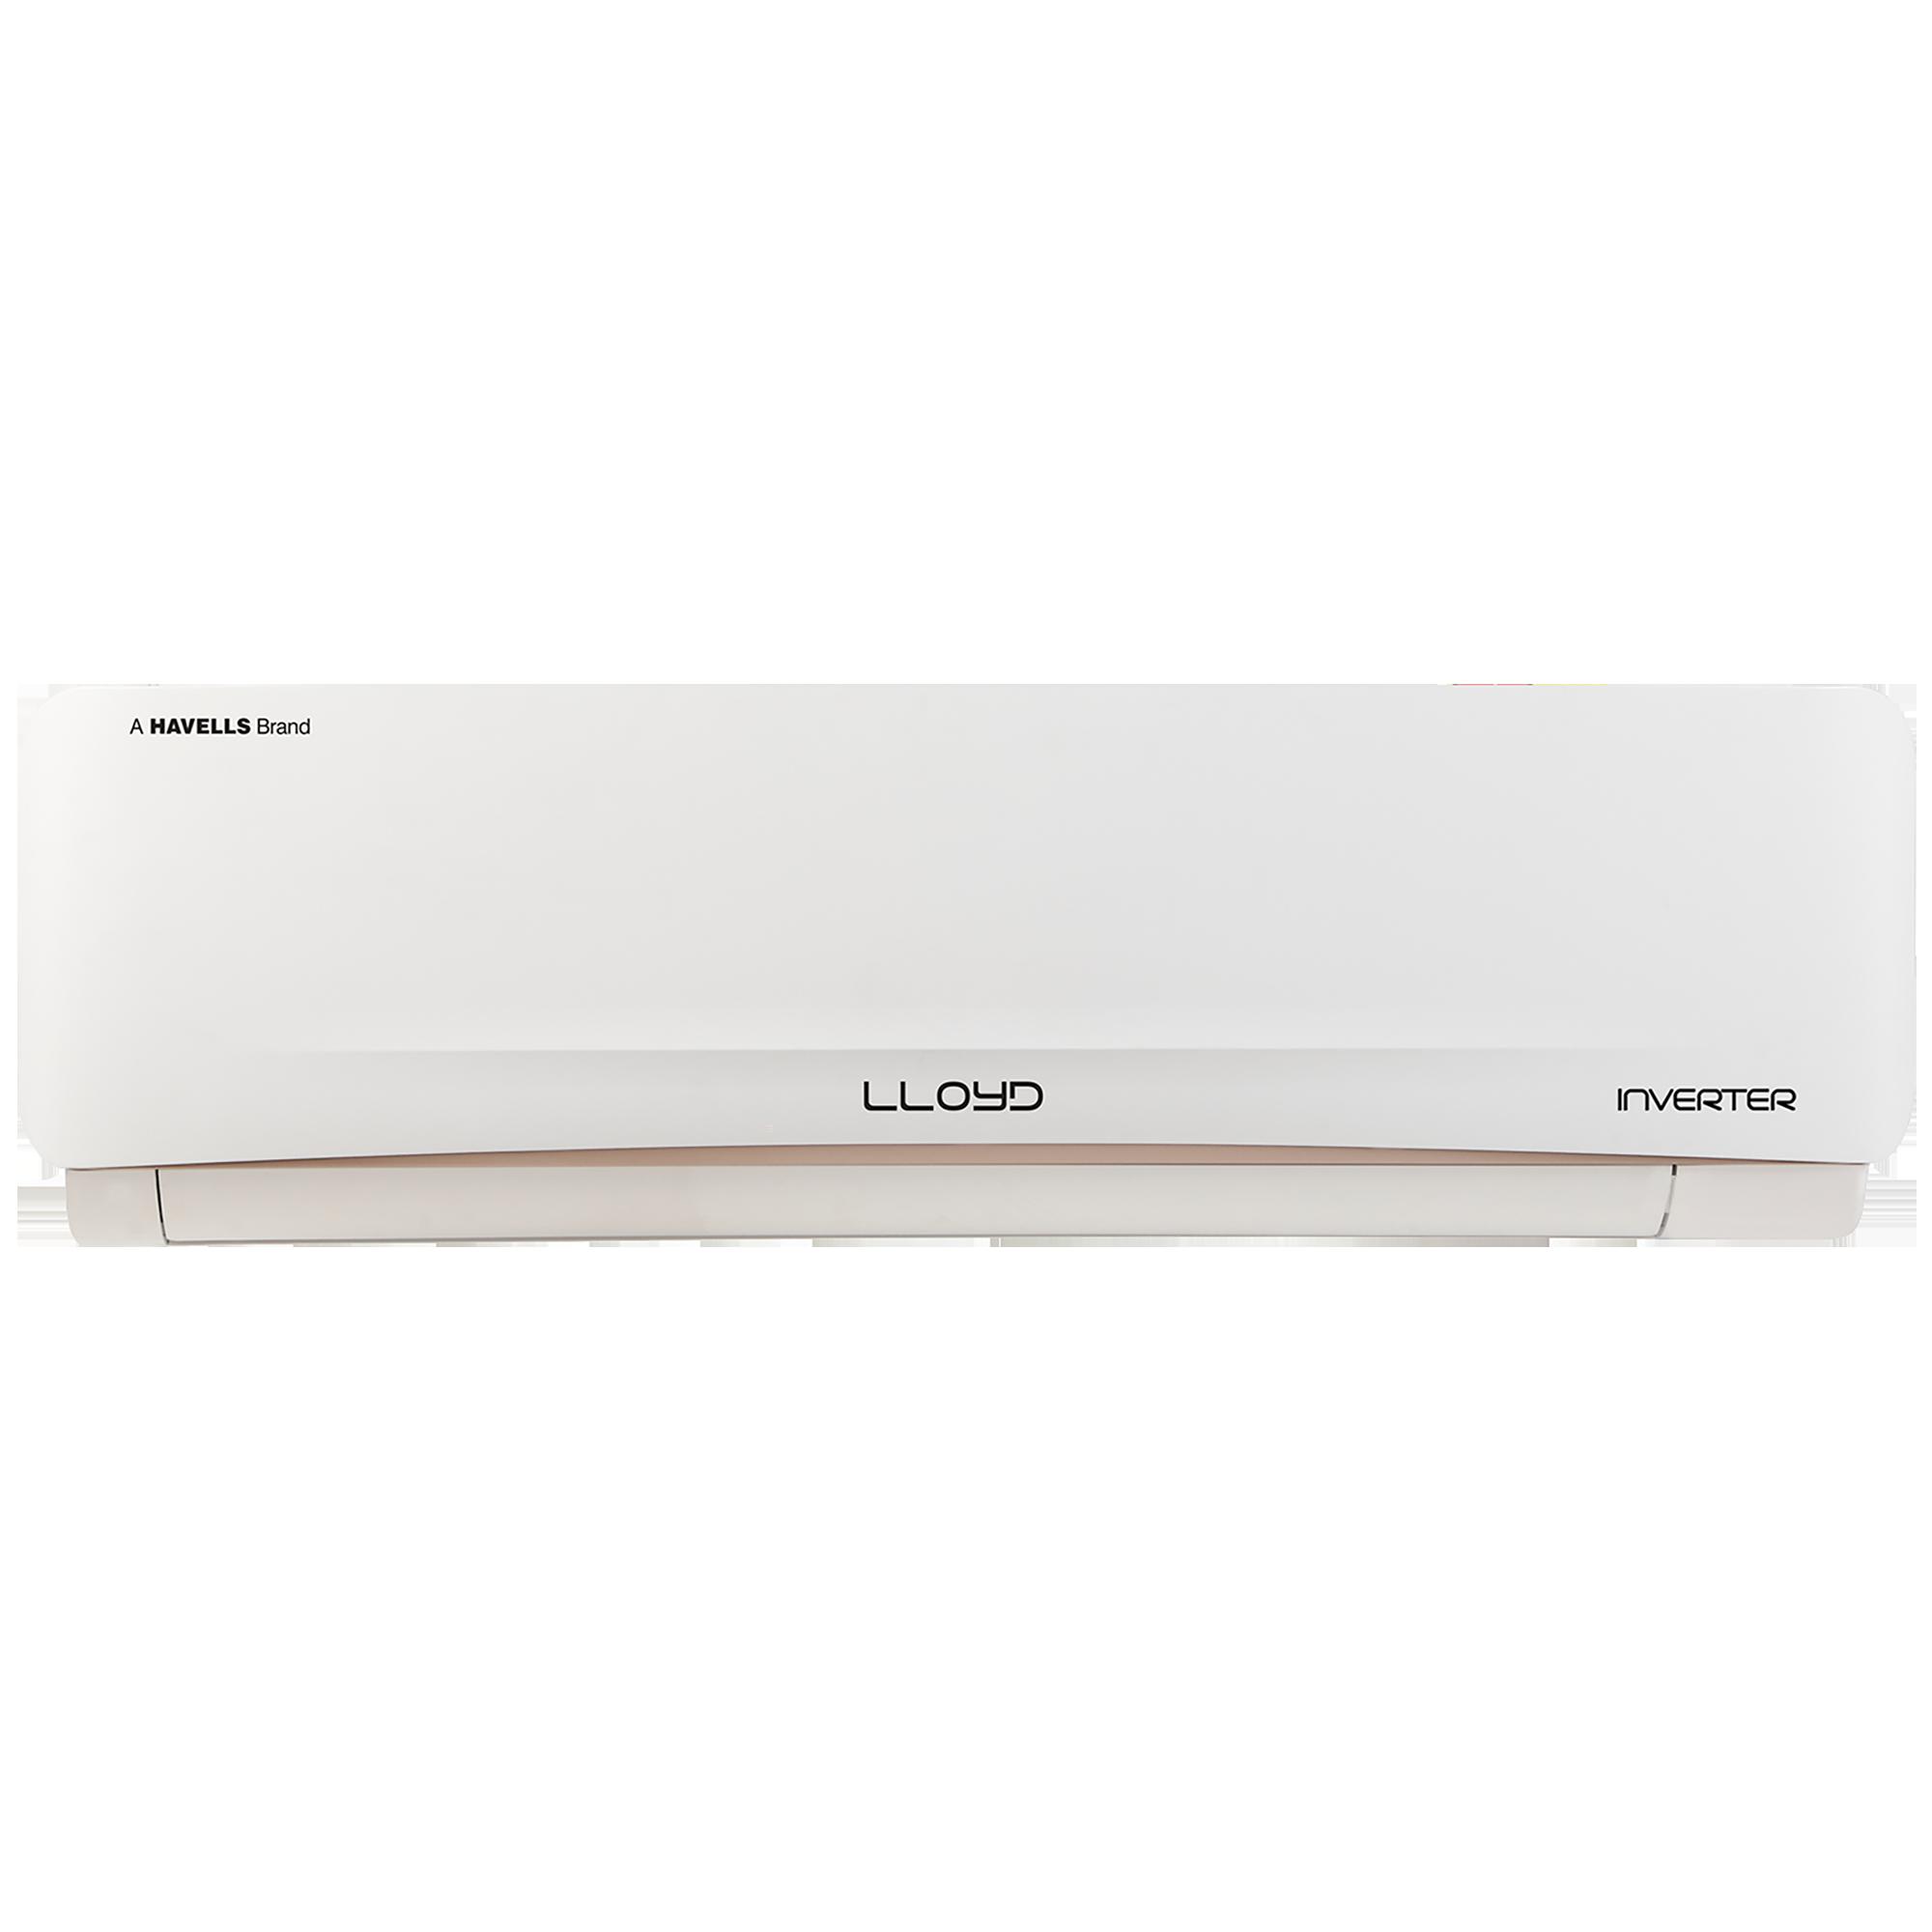 Lloyd WBEL 2 Ton 5 Star Inverter Split AC (Copper Condenser, GLS24I56WBEL, White)_1